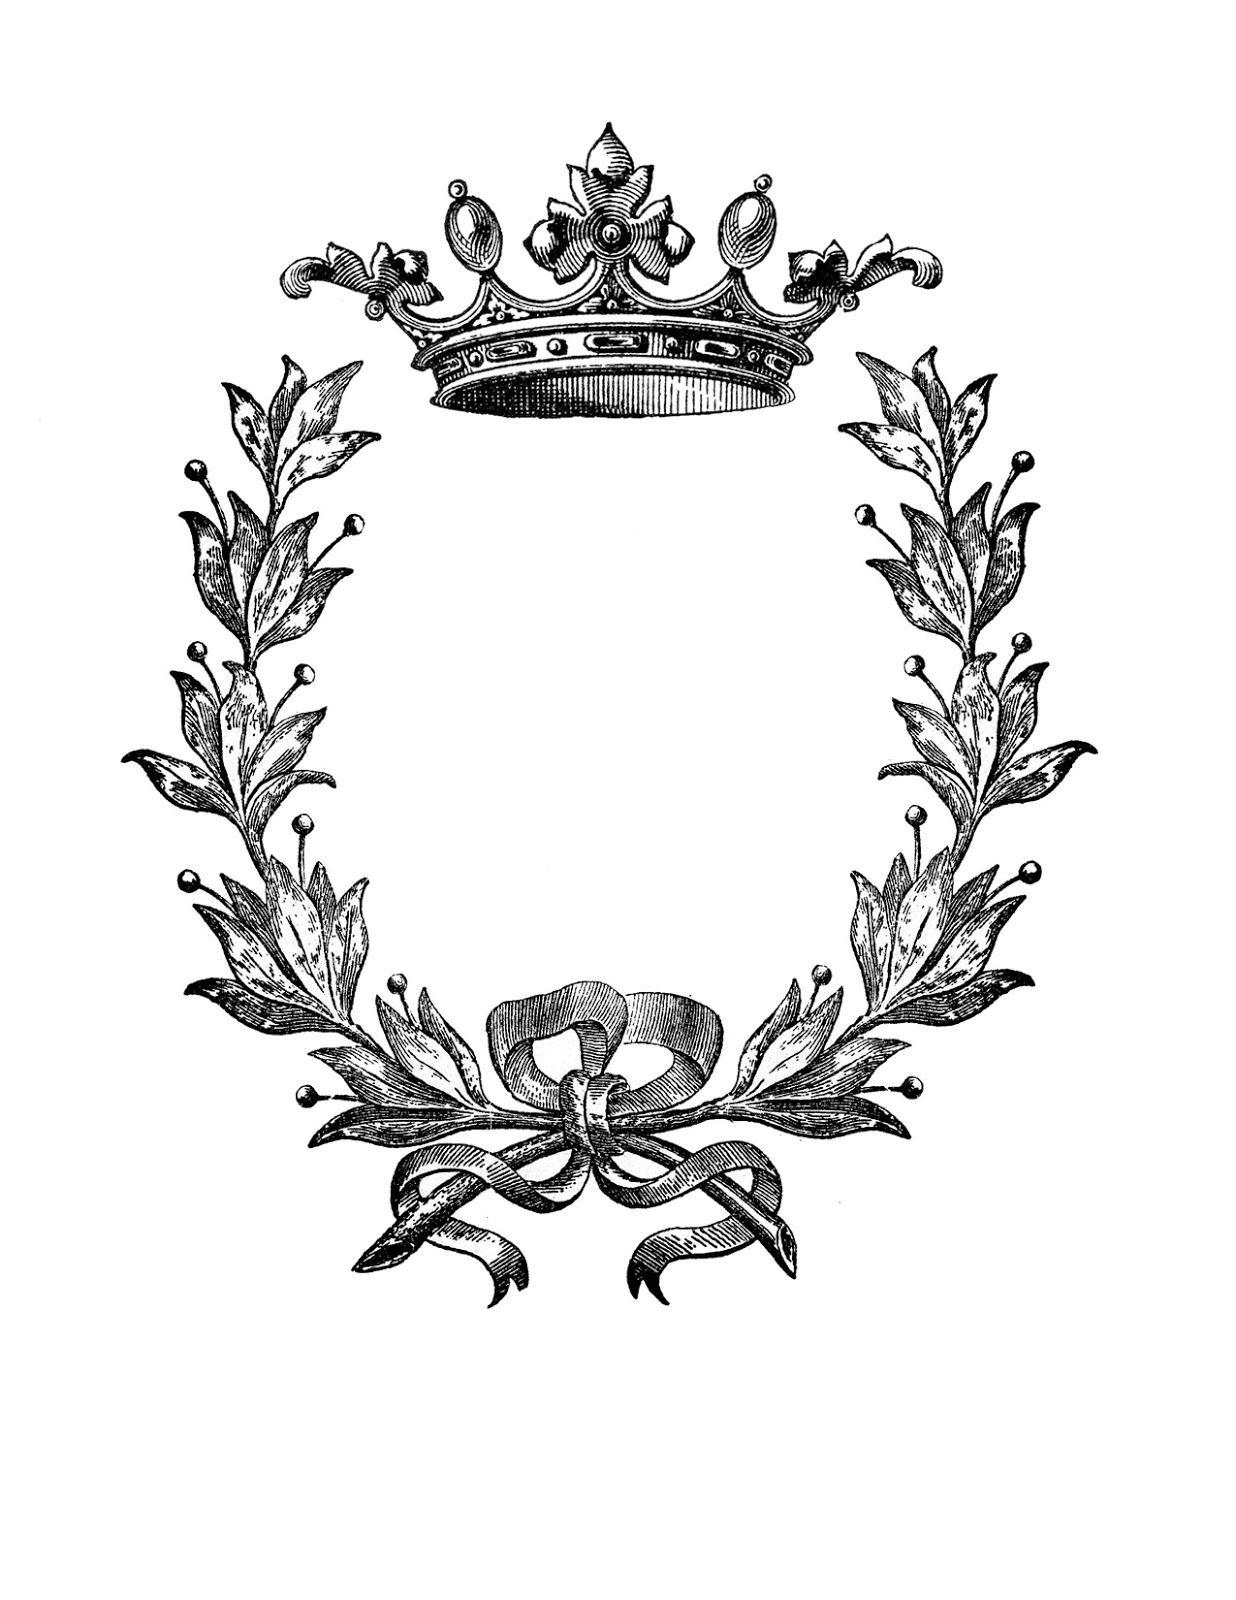 Crown wreath